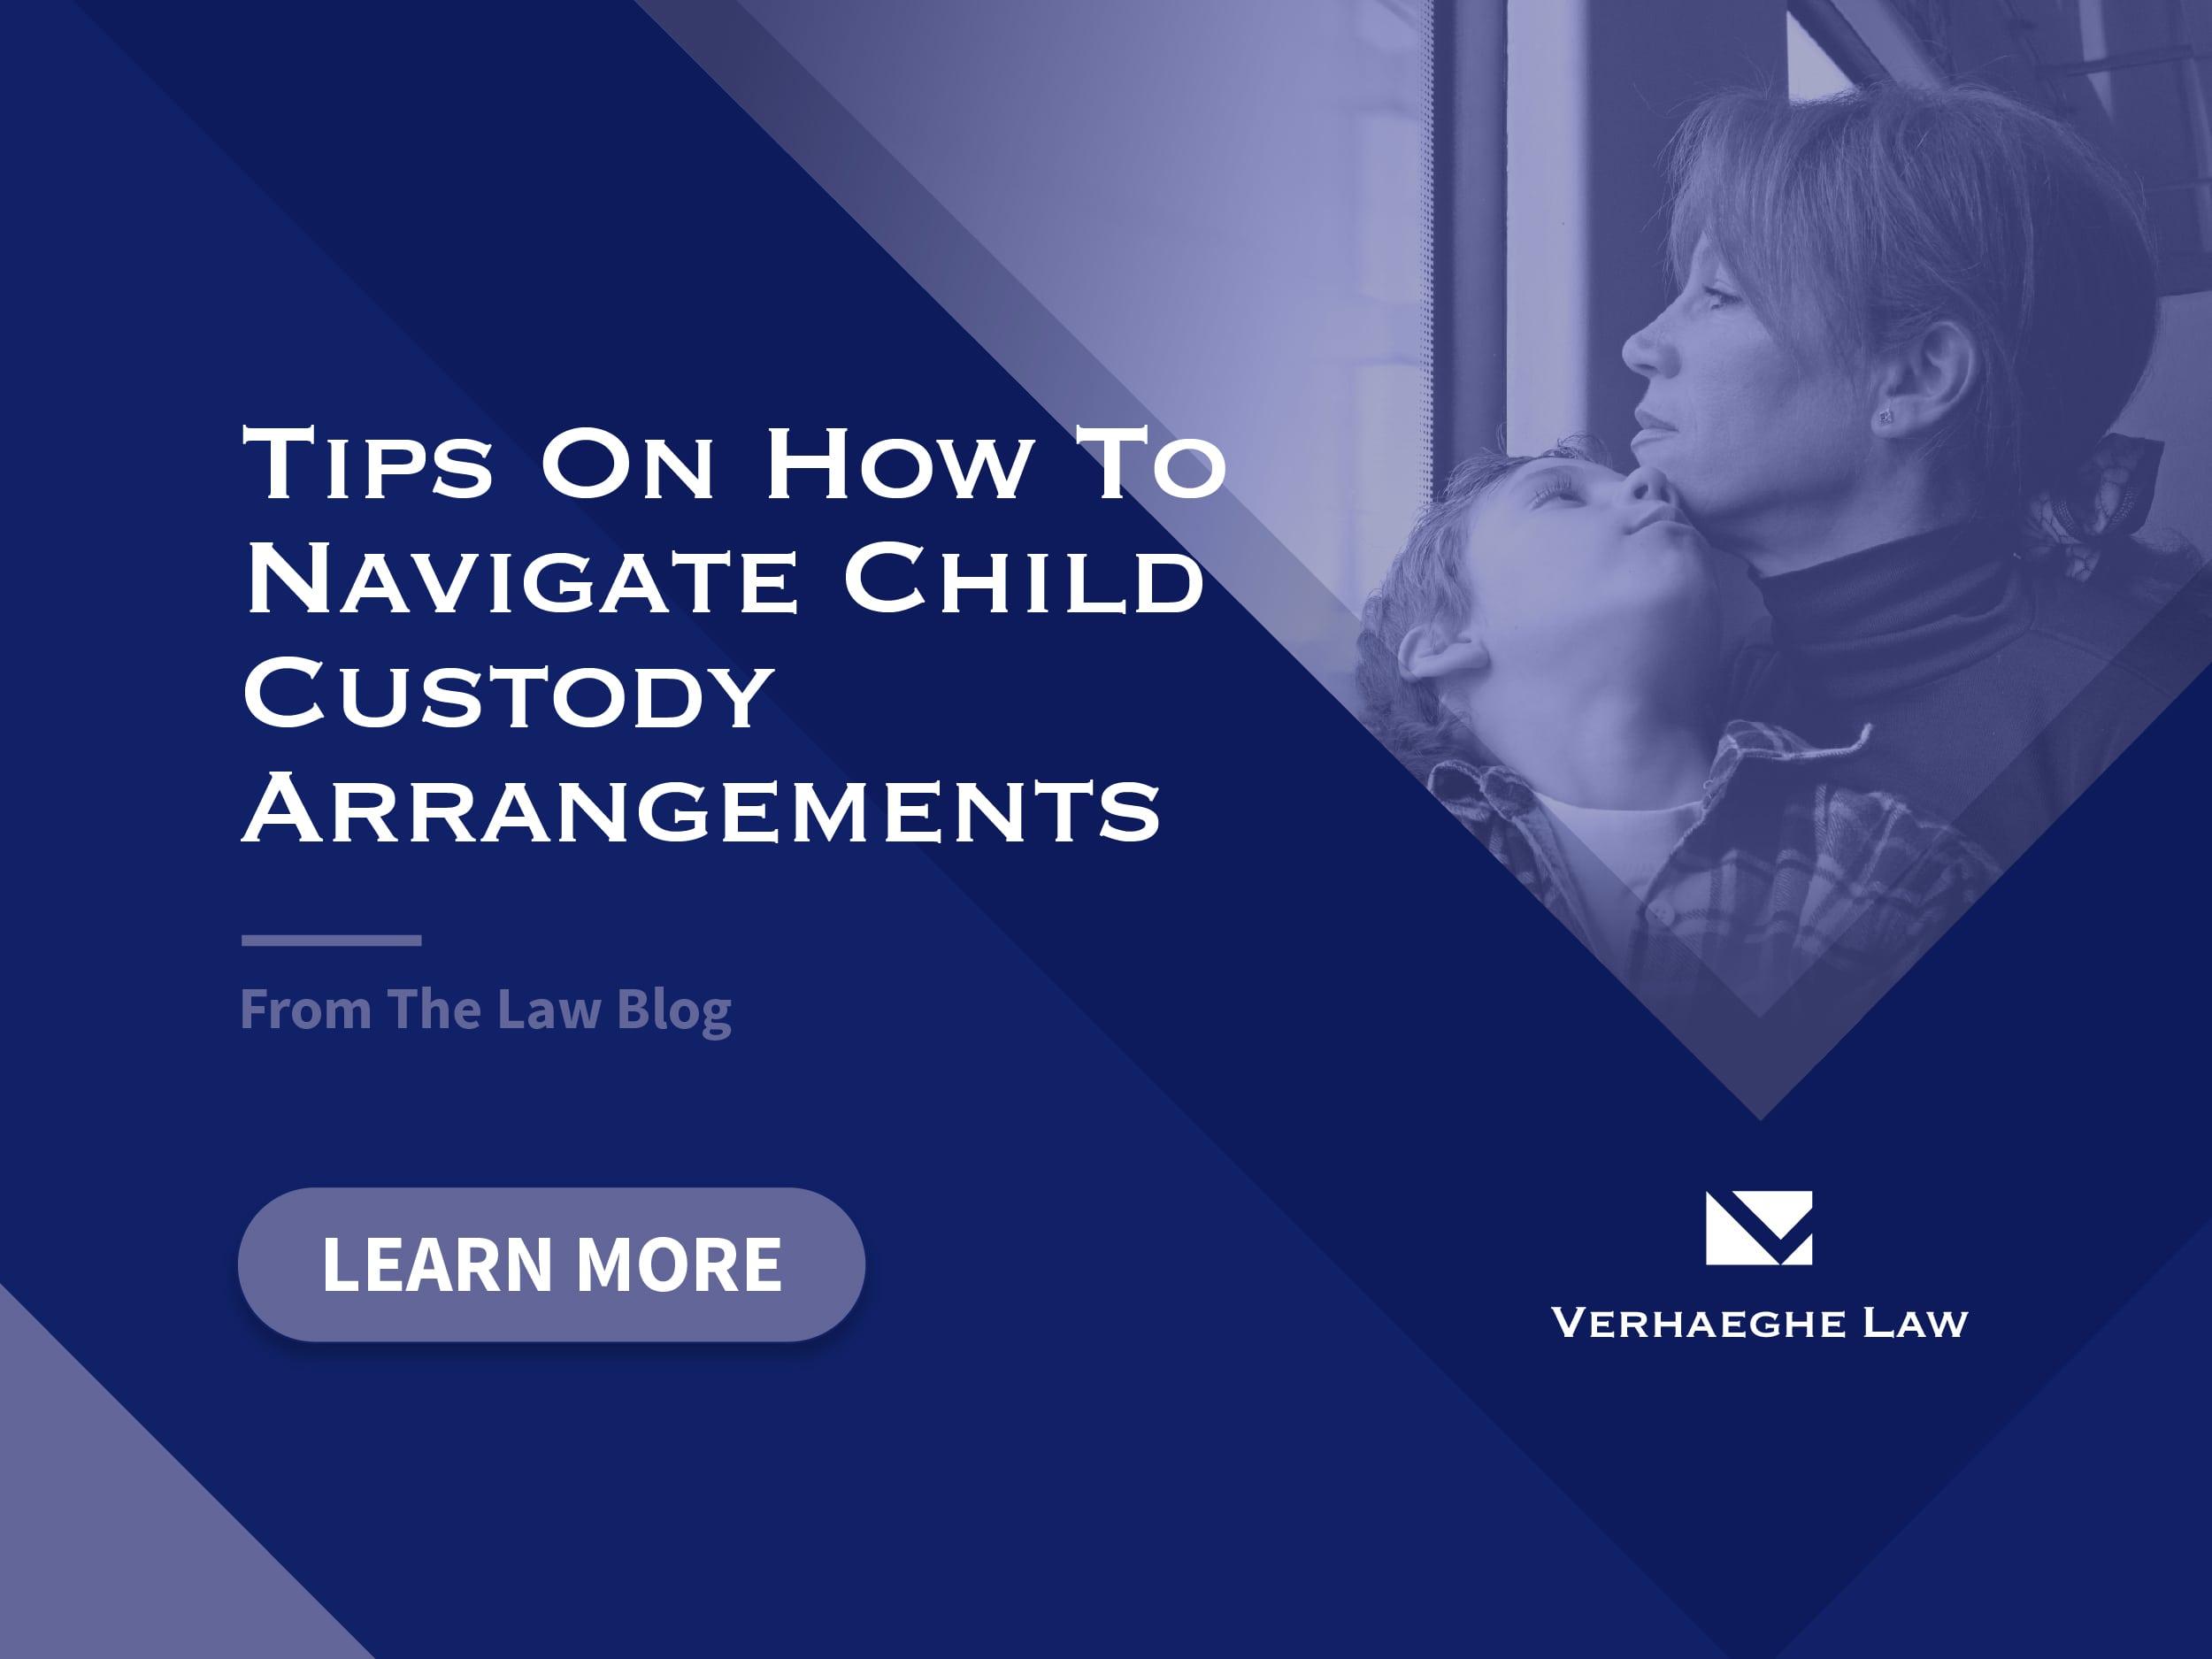 Tips on how to navigate child custody arrangements